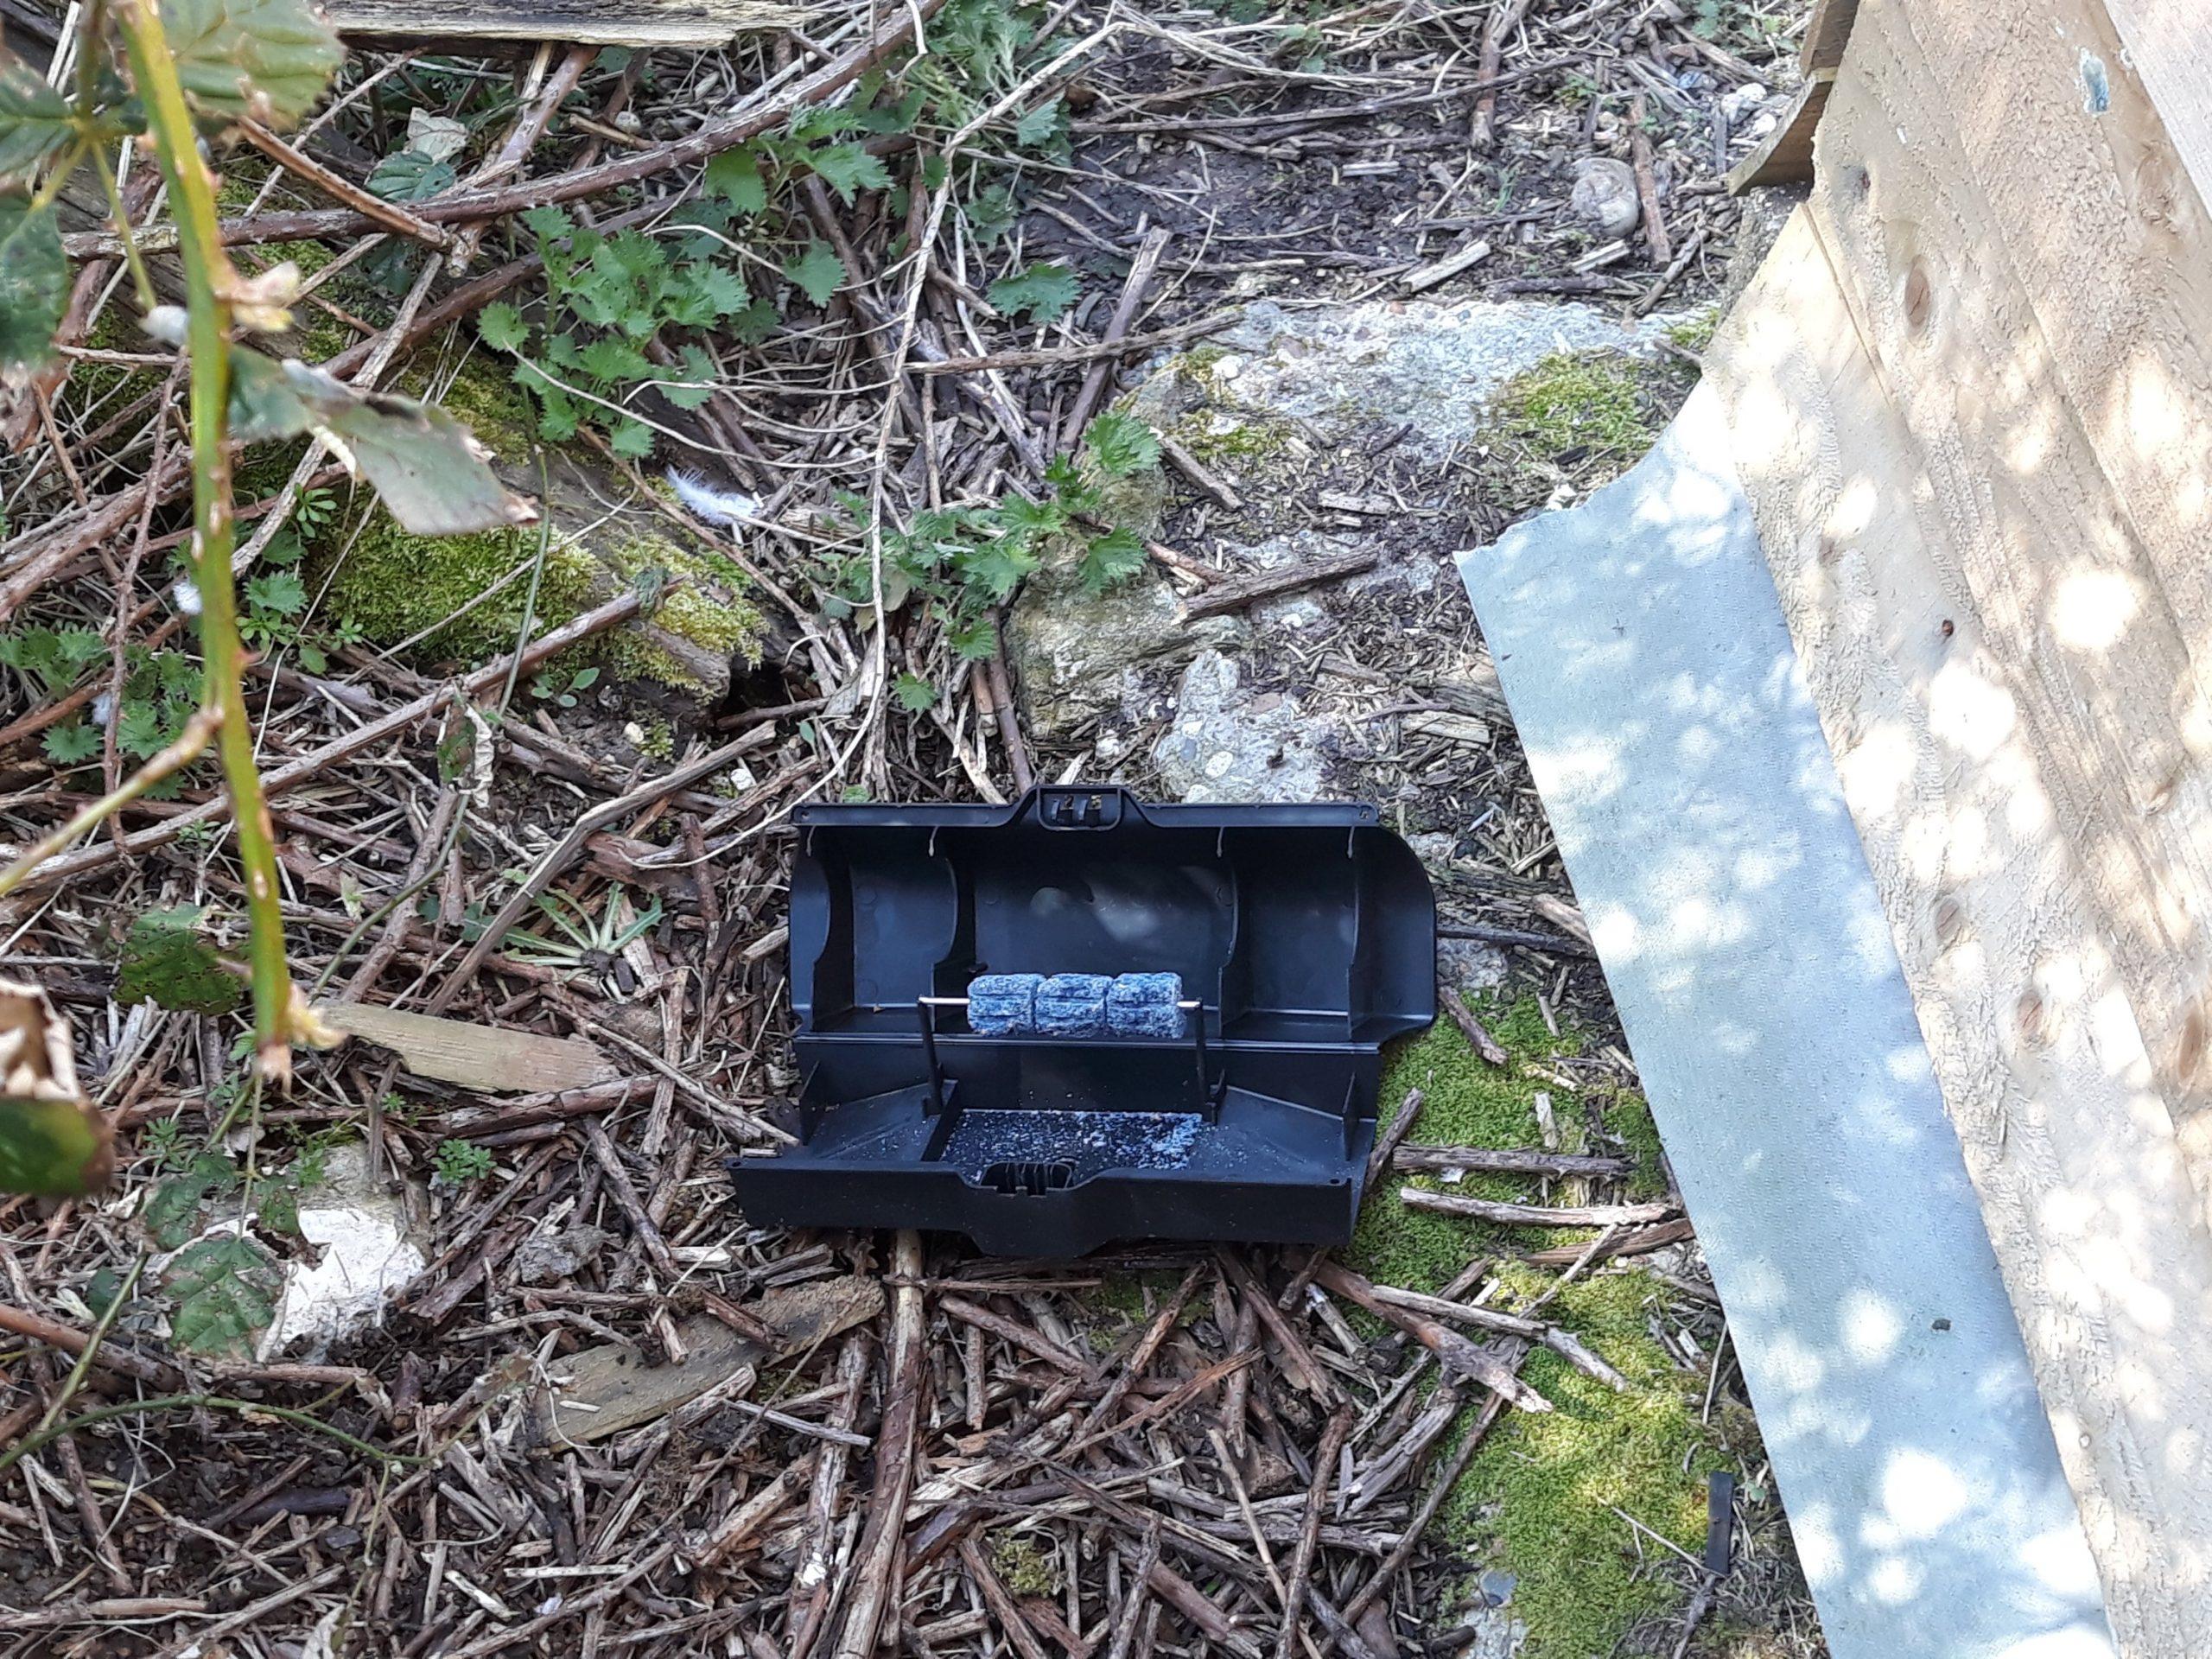 Rat box by Olde English Pest Control, Kent, Surrey a